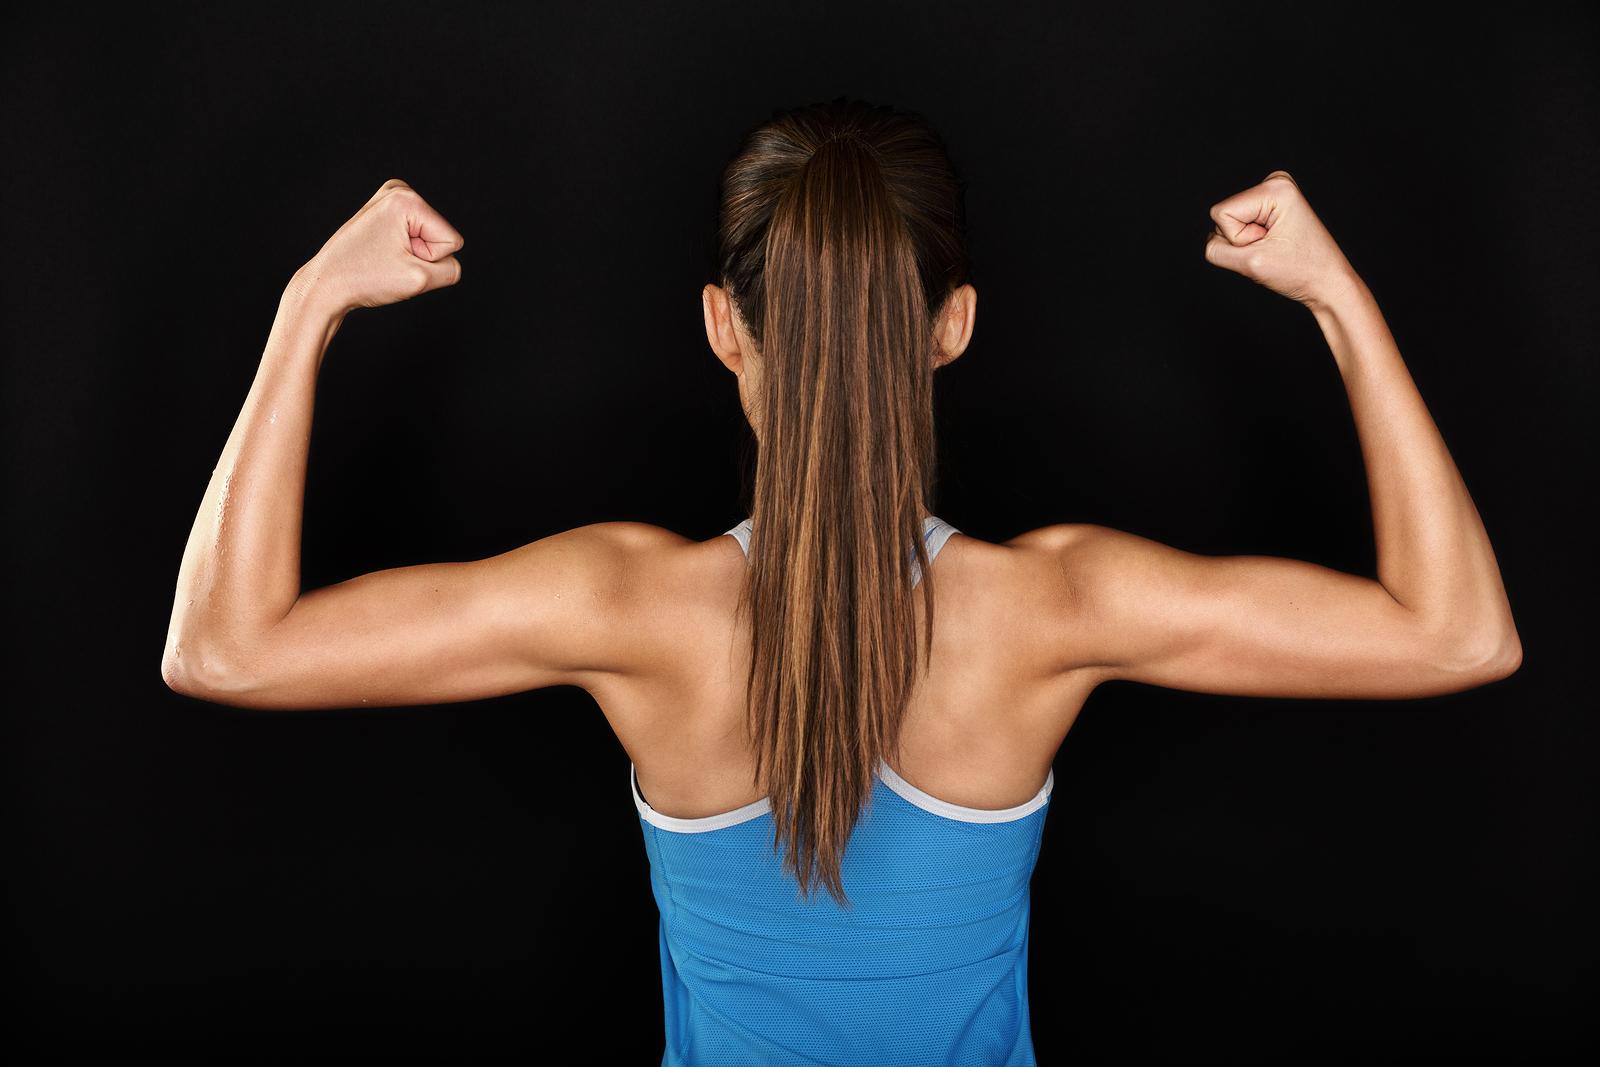 FIVE EXERCISES THAT WON'T FEEL LIKE WORK